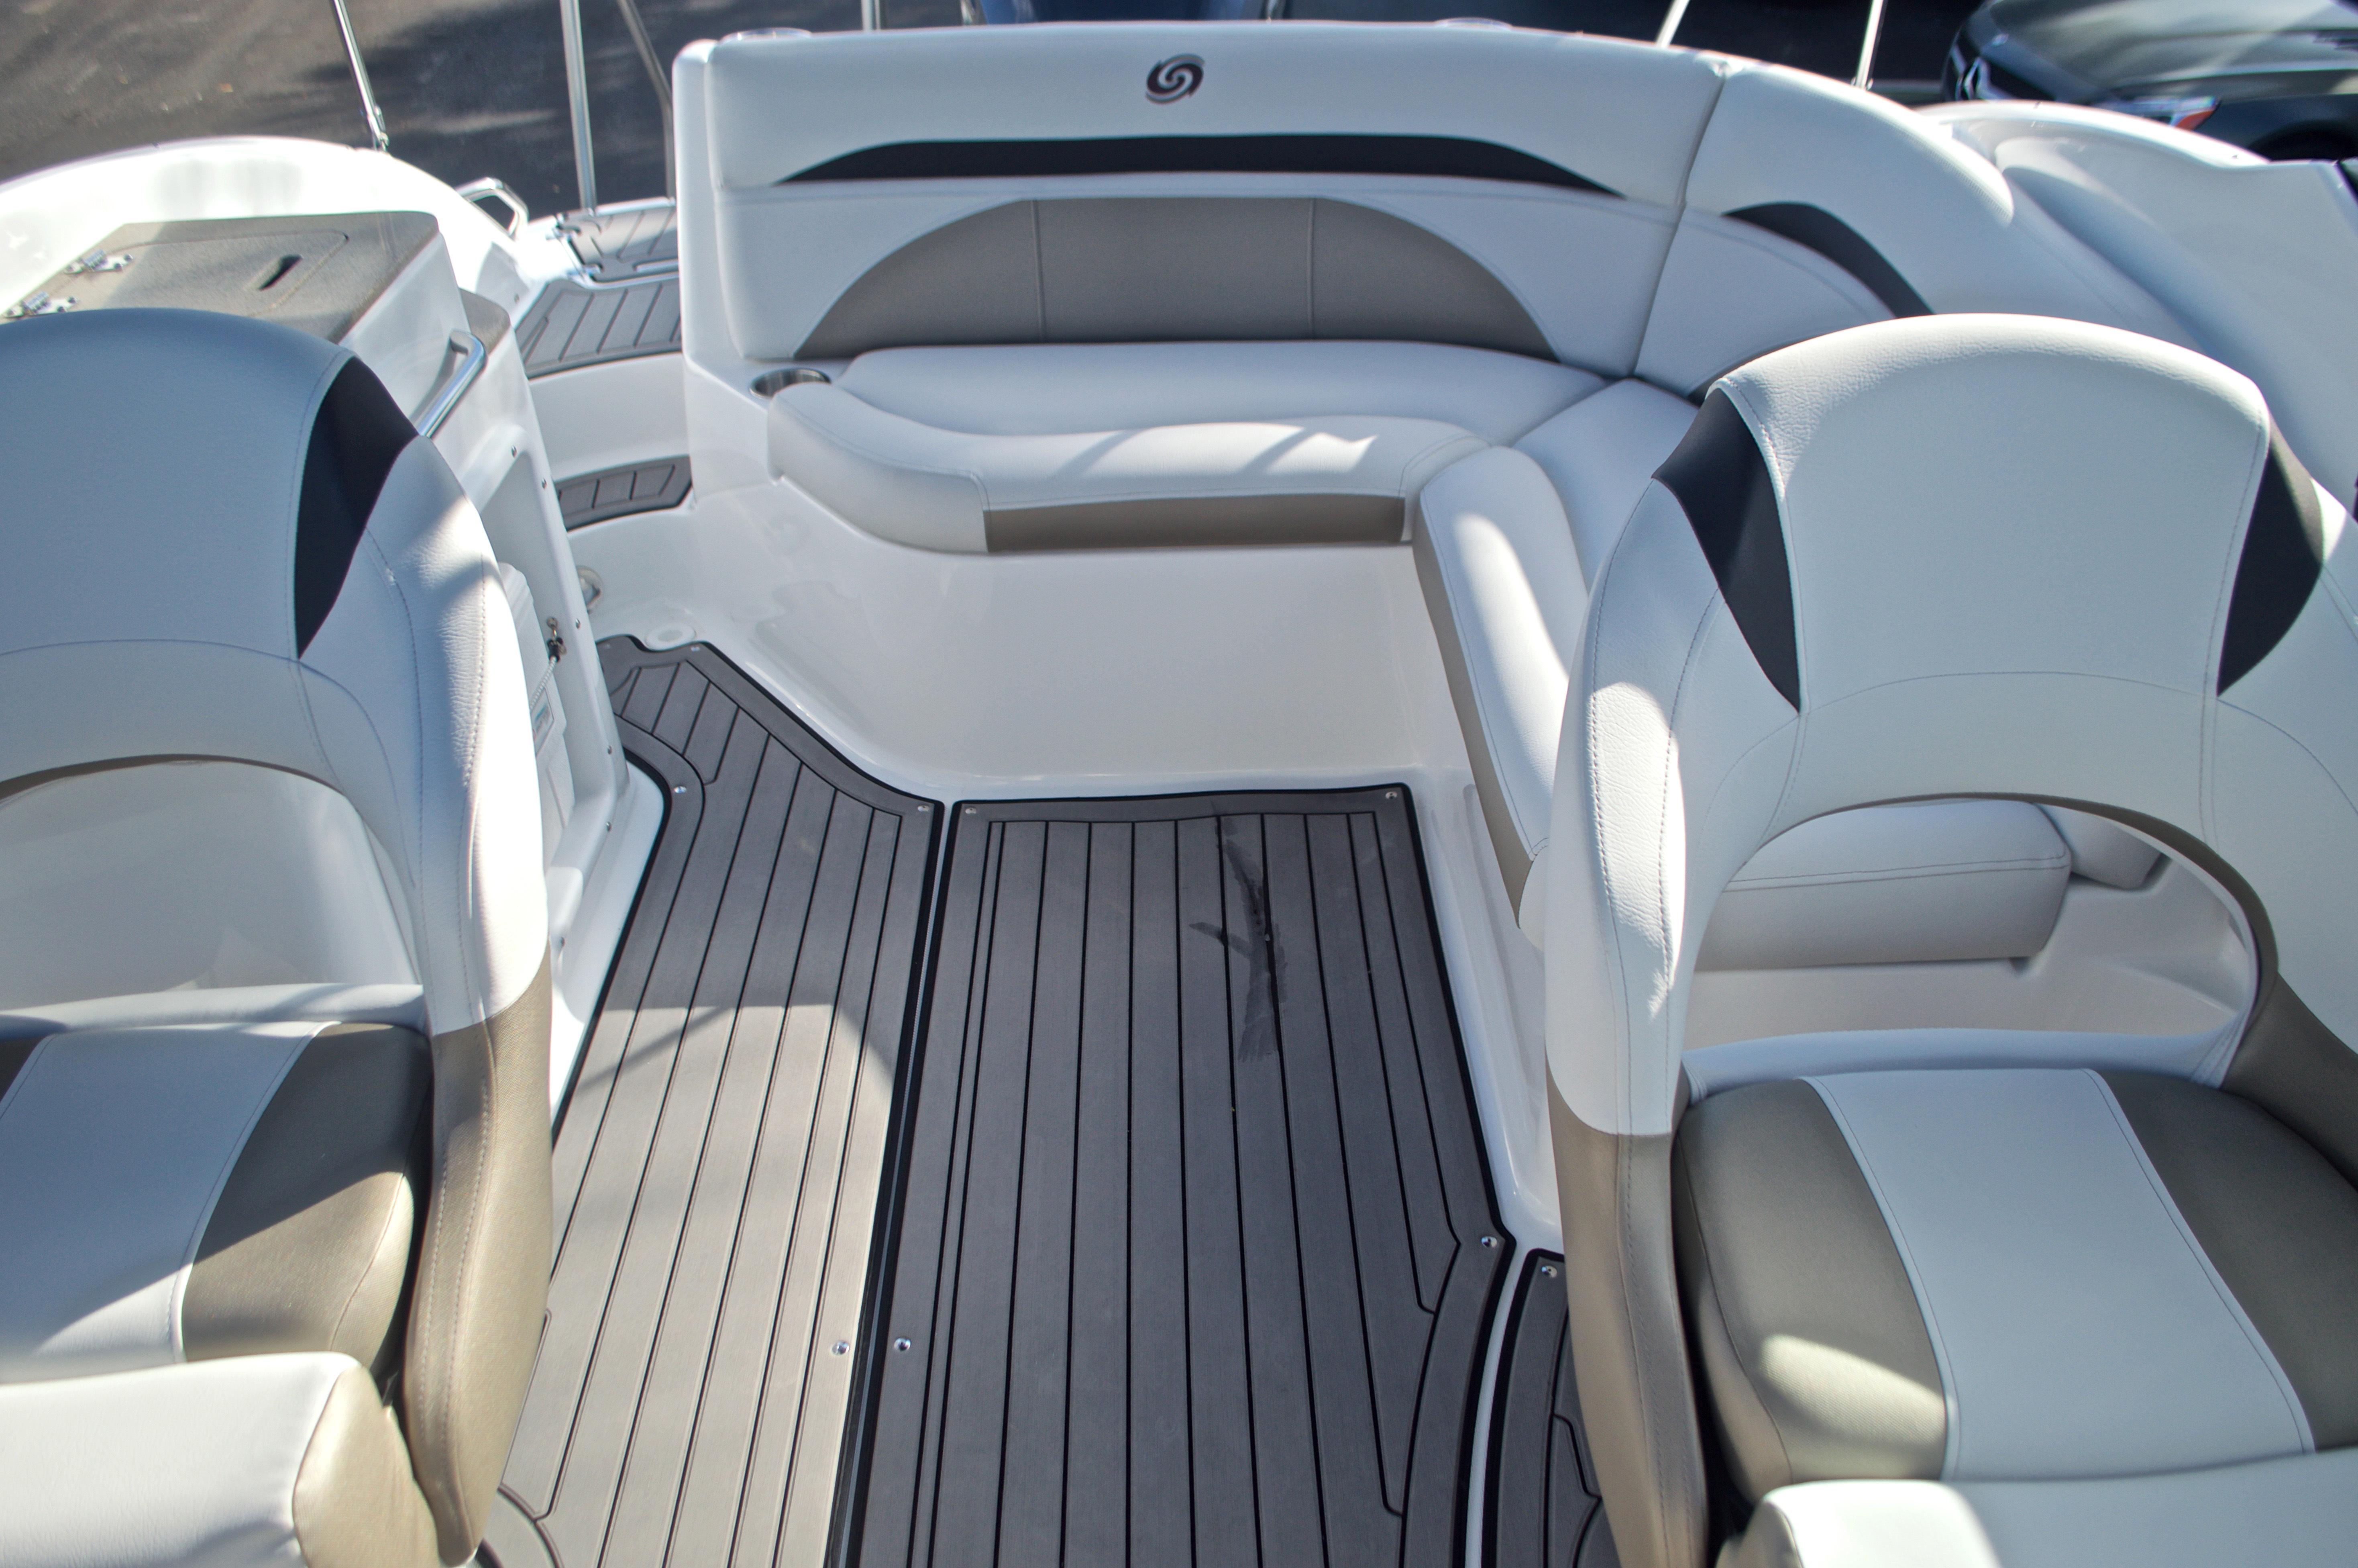 Thumbnail 15 for New 2017 Hurricane SunDeck SD 2400 OB boat for sale in Miami, FL